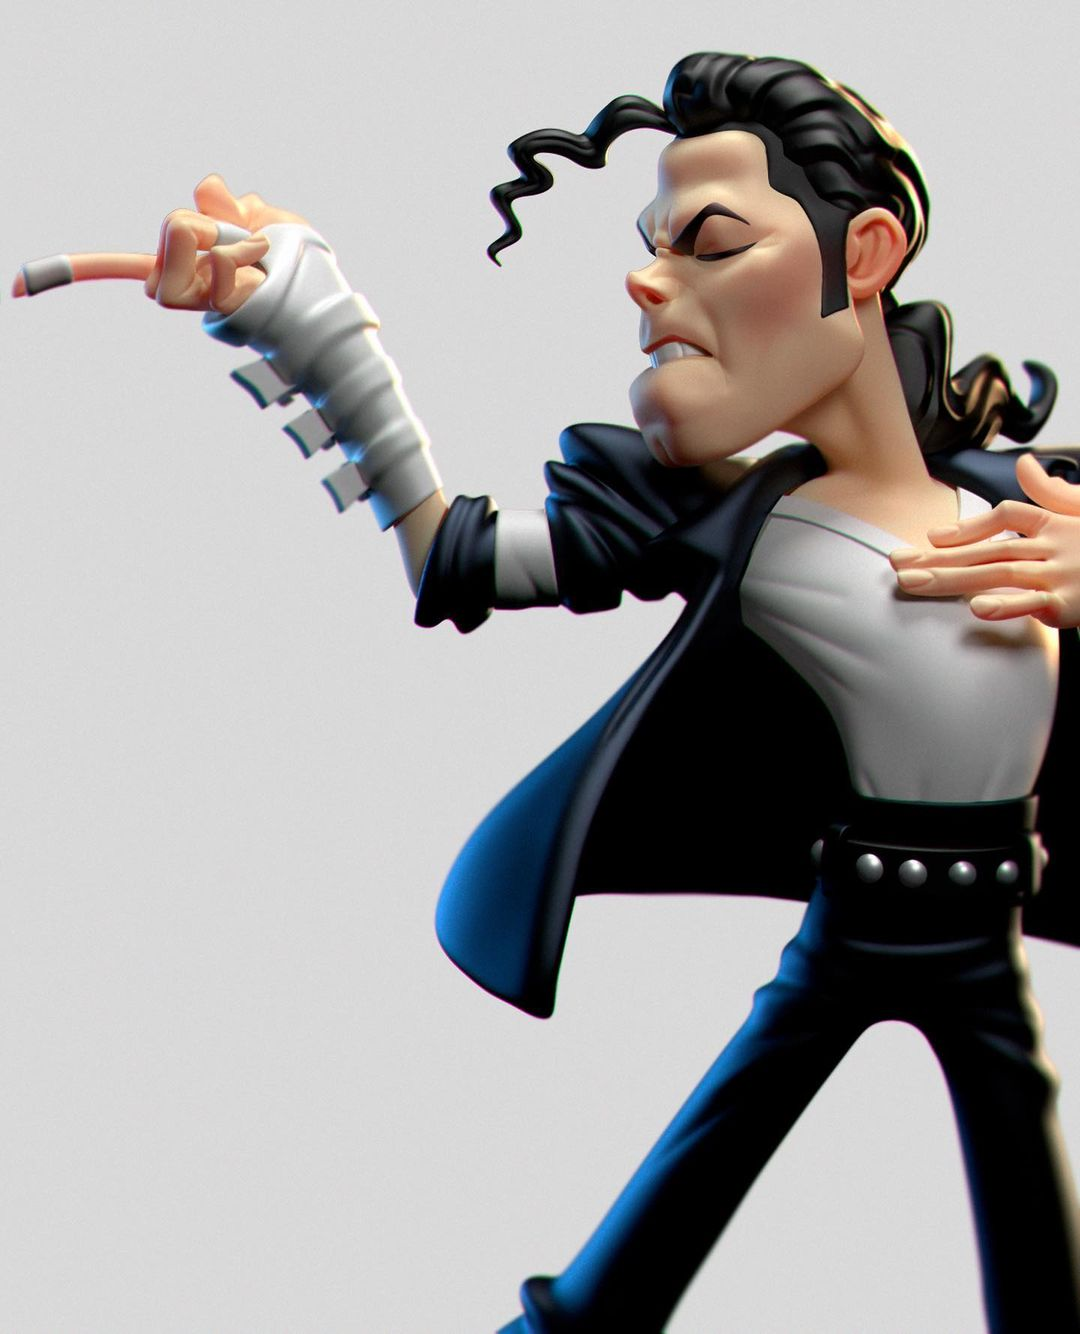 funny 3d model character michael jackson